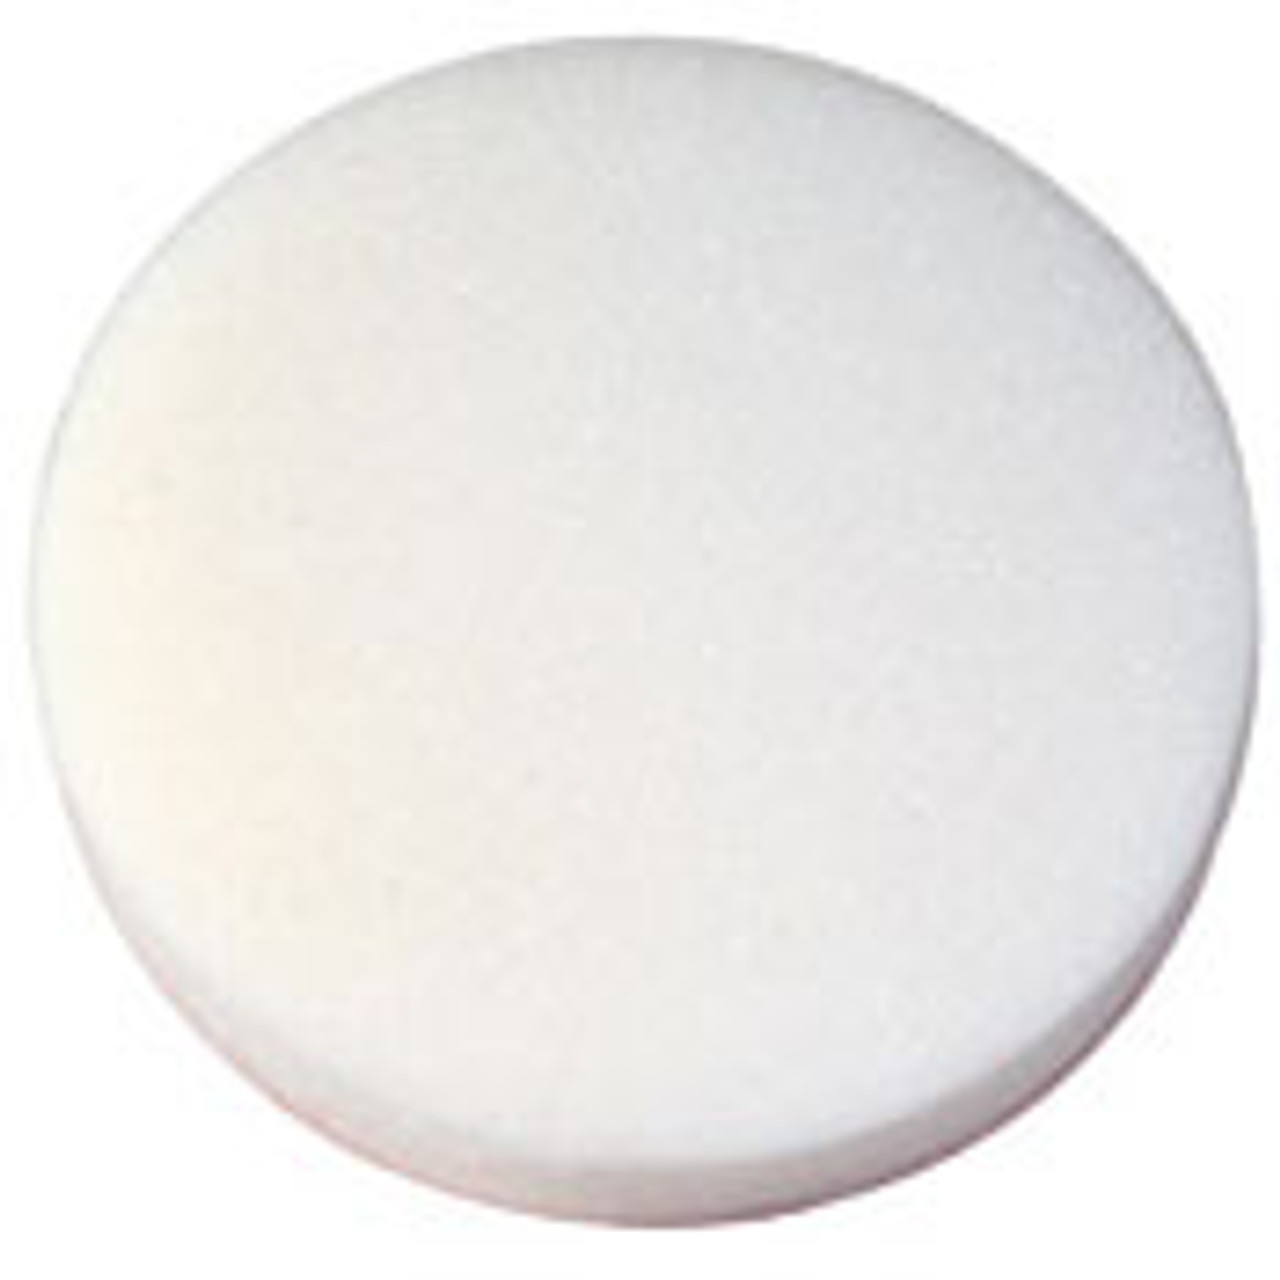 "Bosch 5"" Sponge Applicator Pad, Sander Accessory"